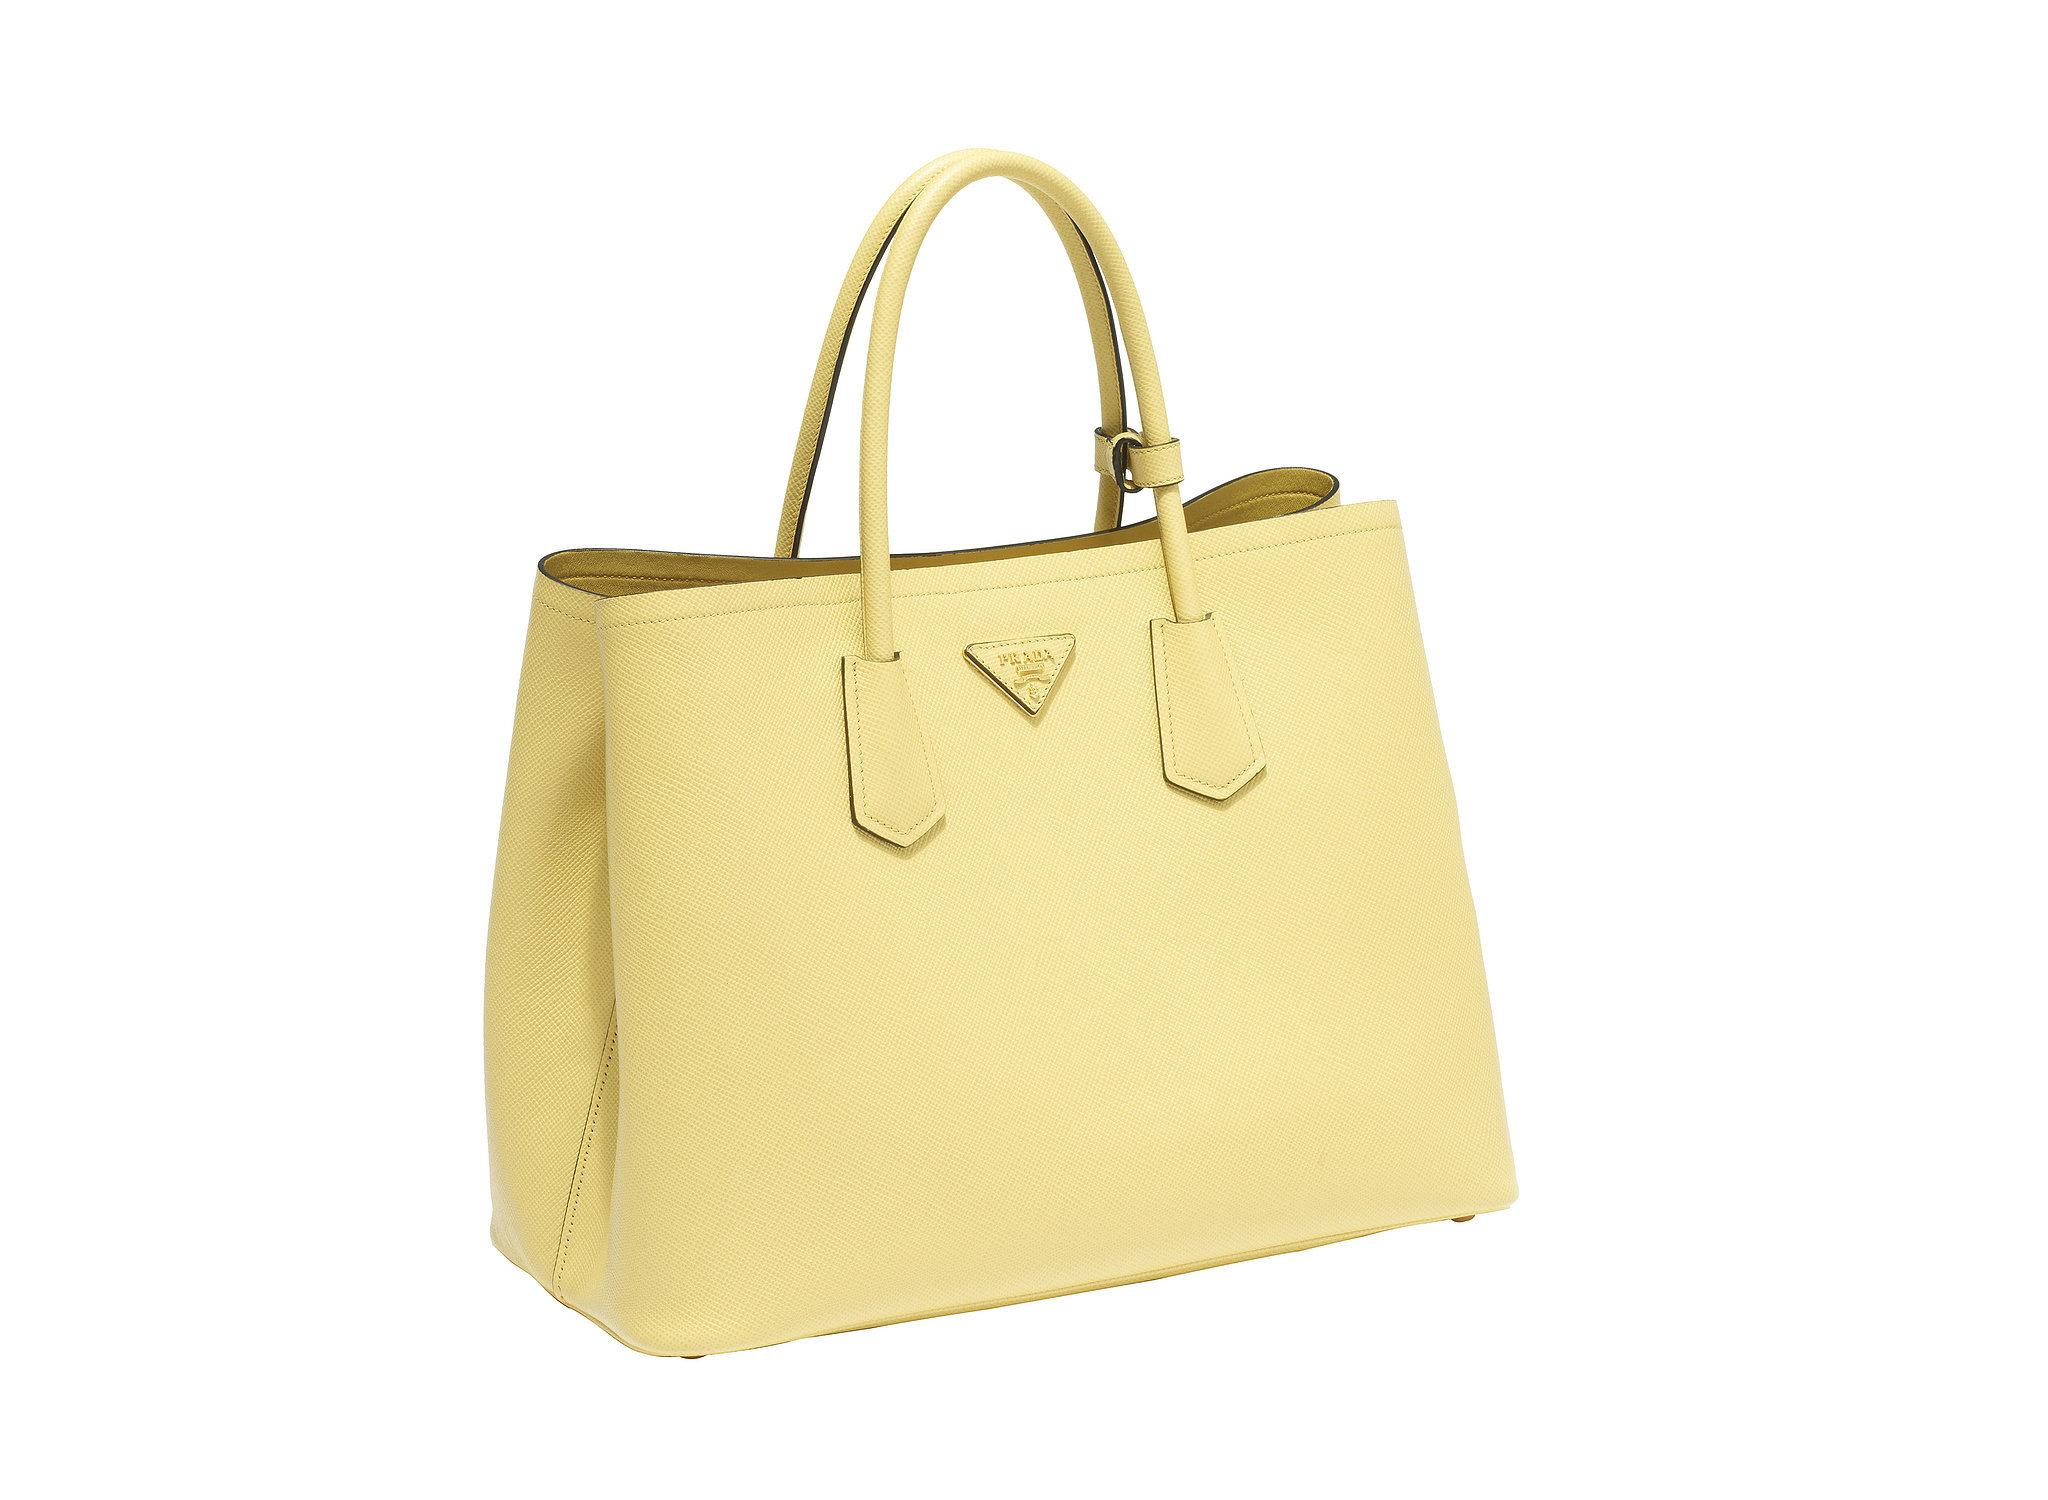 www prada handbags black prada bag with gold hardware. Black Bedroom Furniture Sets. Home Design Ideas